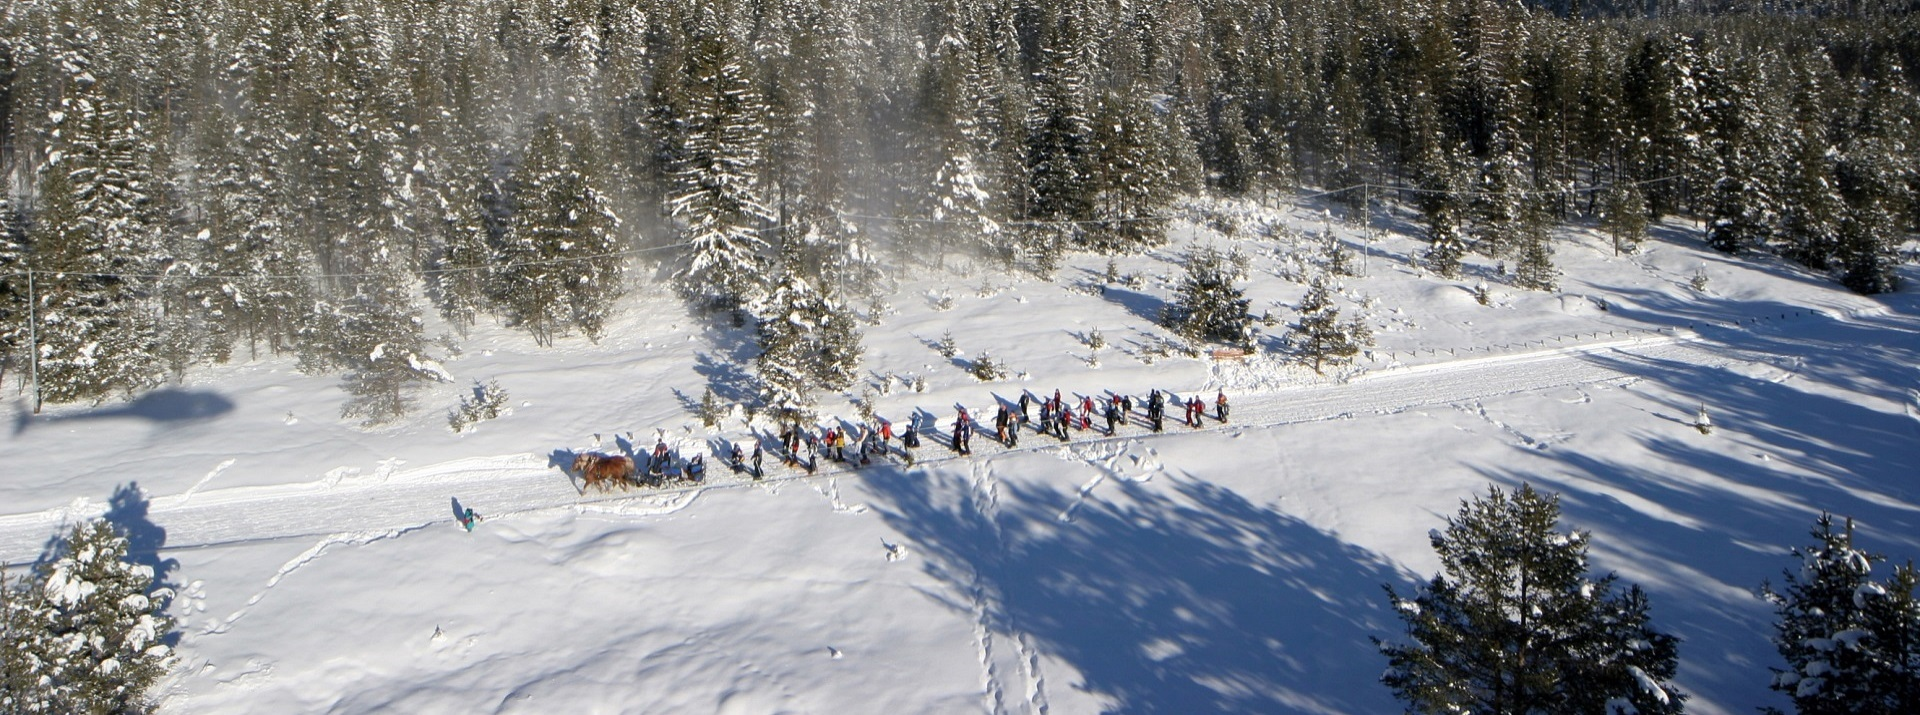 Best Pistes Hidden Valley Dolomites Noleggio Sci Cortina